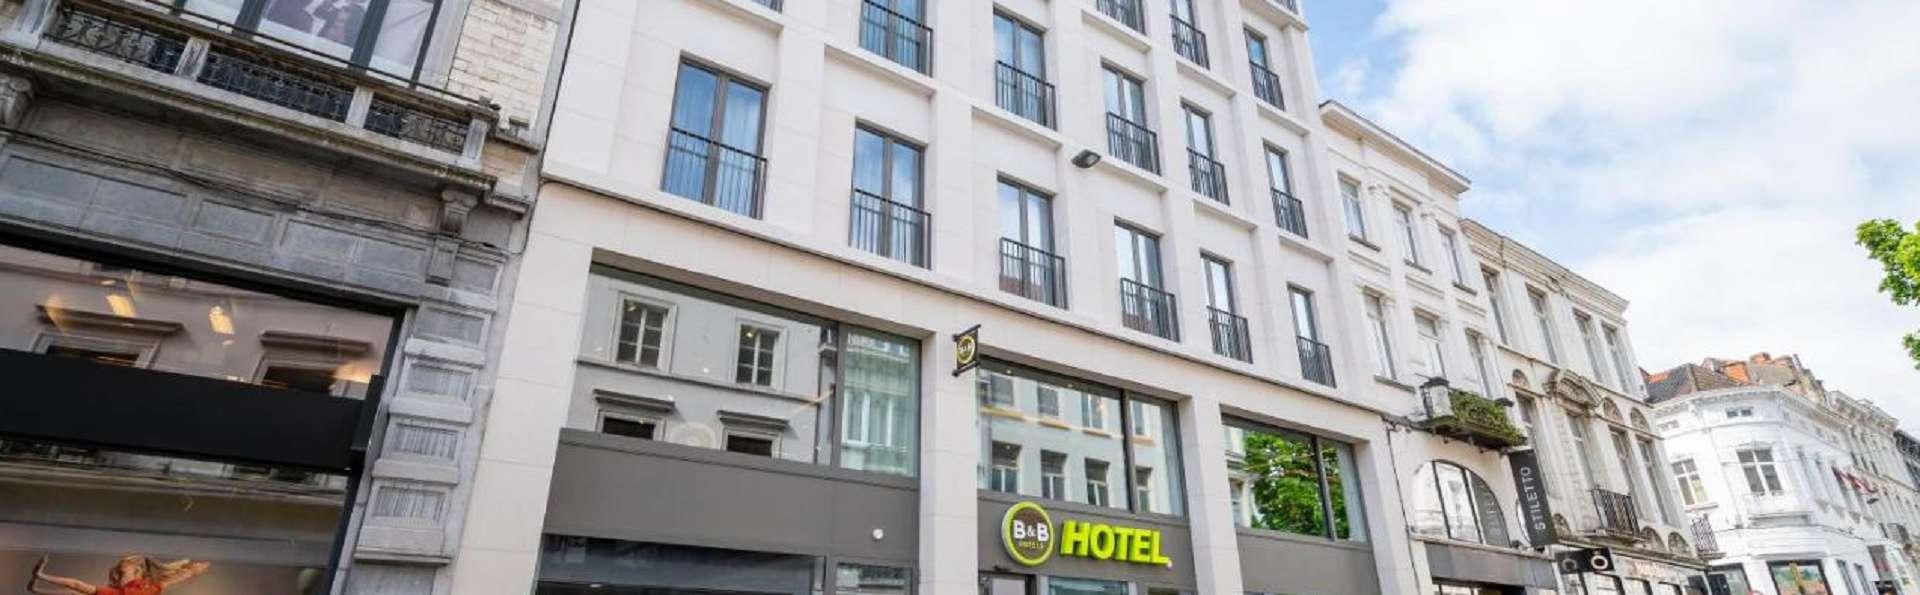 B&B Hotel Gent Centrum - hotel_1.jpg